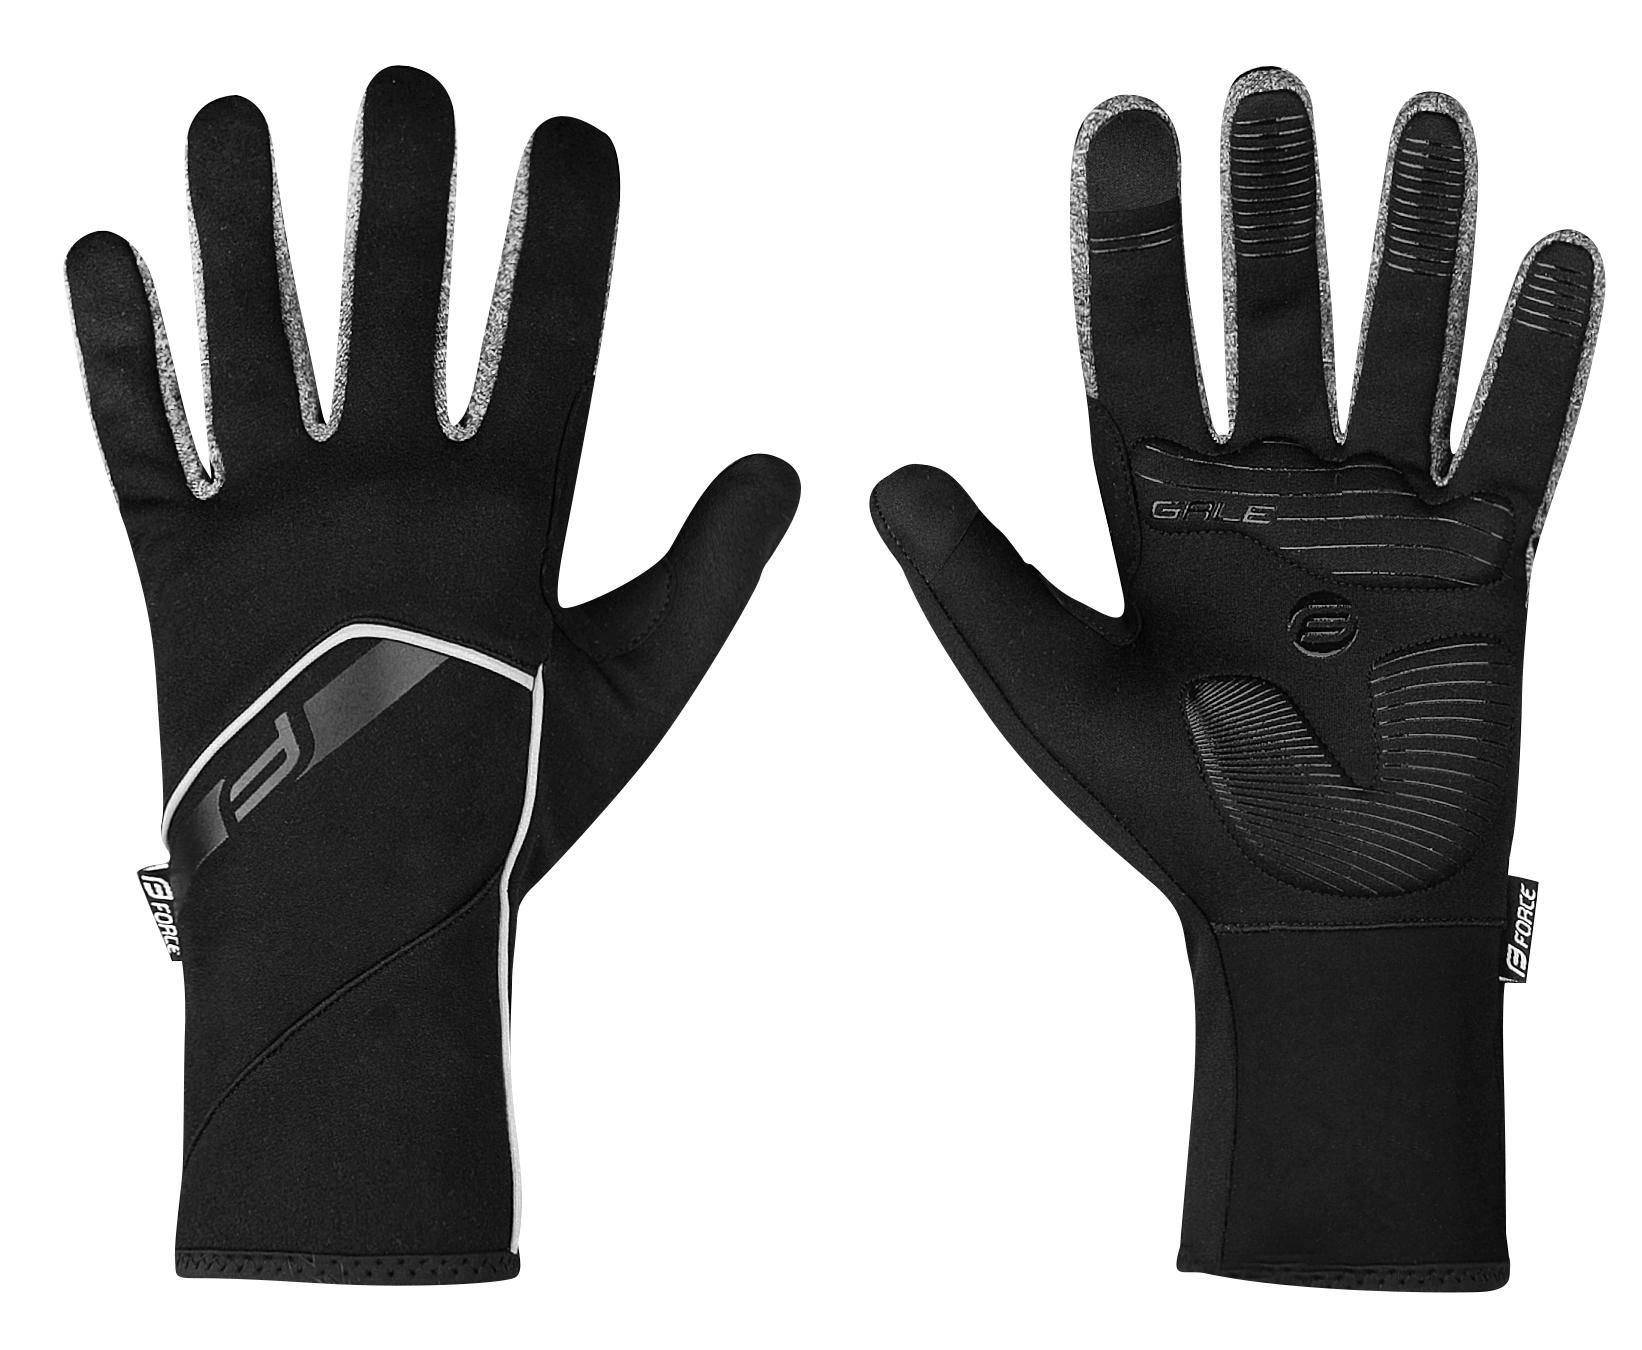 rukavice FORCE GALE softshell, jaro-podzim, černé XXL